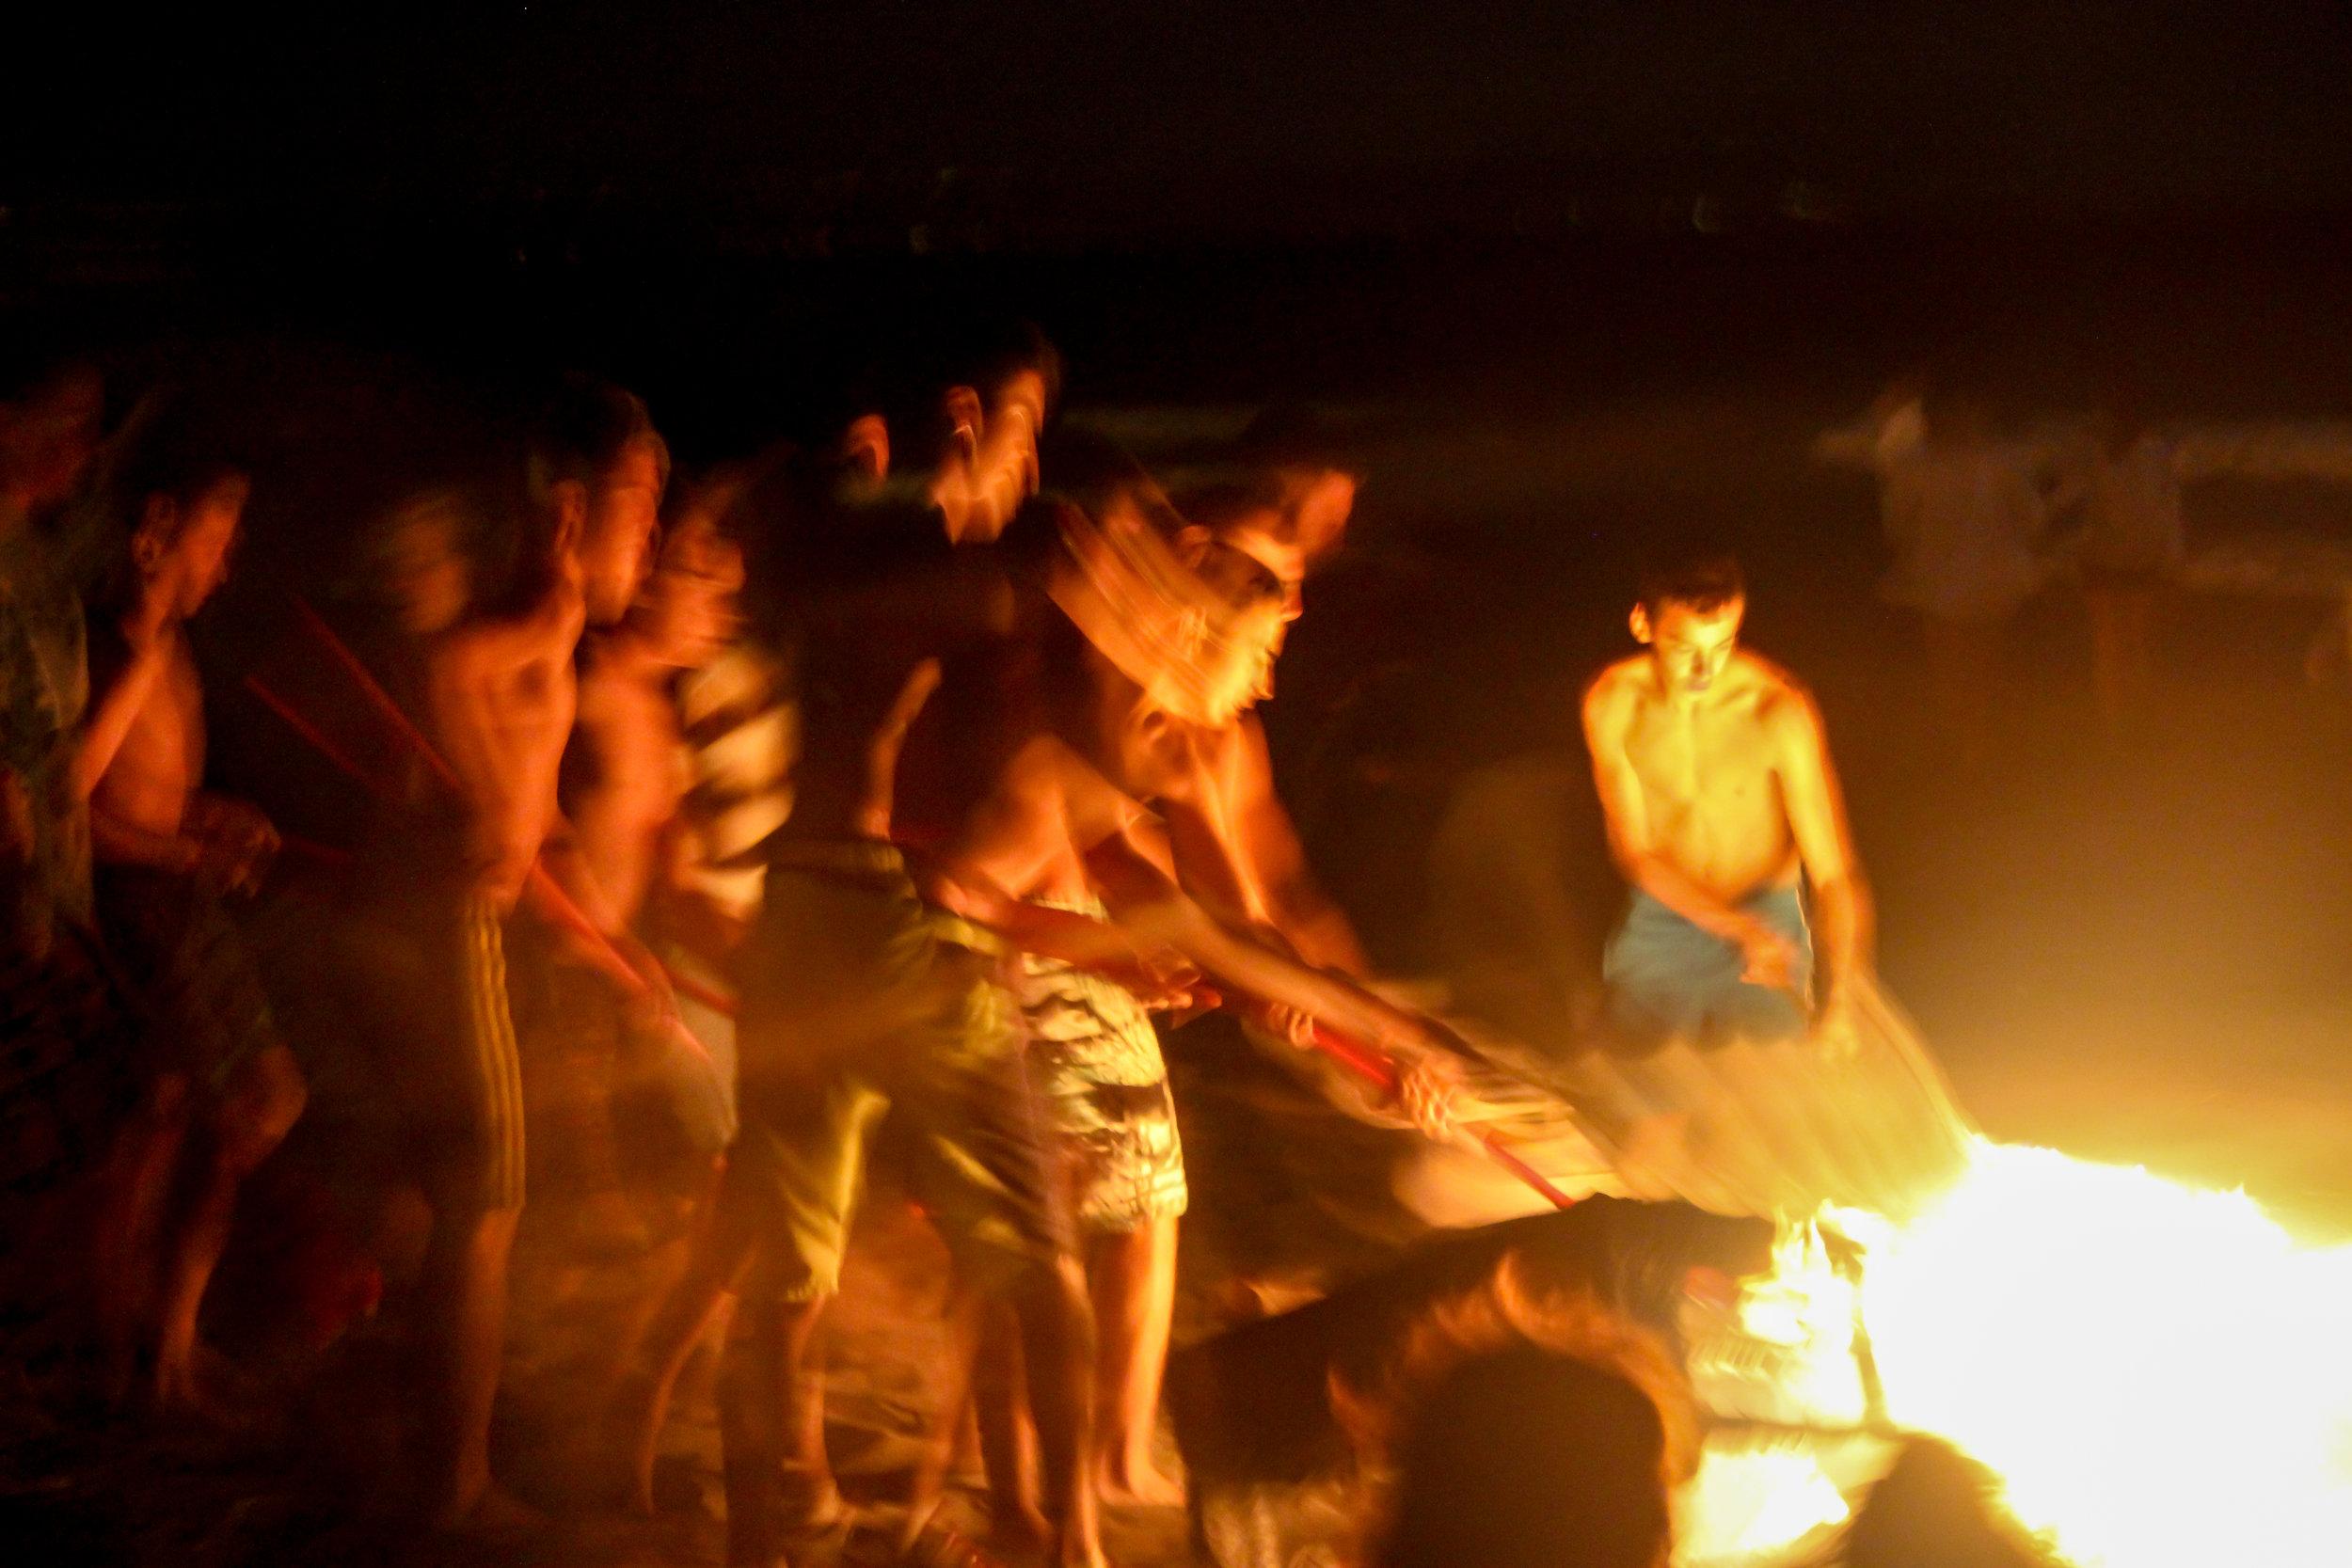 The Night of San Juan, bonfire festival, Playa de Santa Bárbara, La Linea de la Concepcion, Mediterranean Sea, Cádiz, Andalusia, Spain, Europe | www.DoLessGetMoreDone.com |